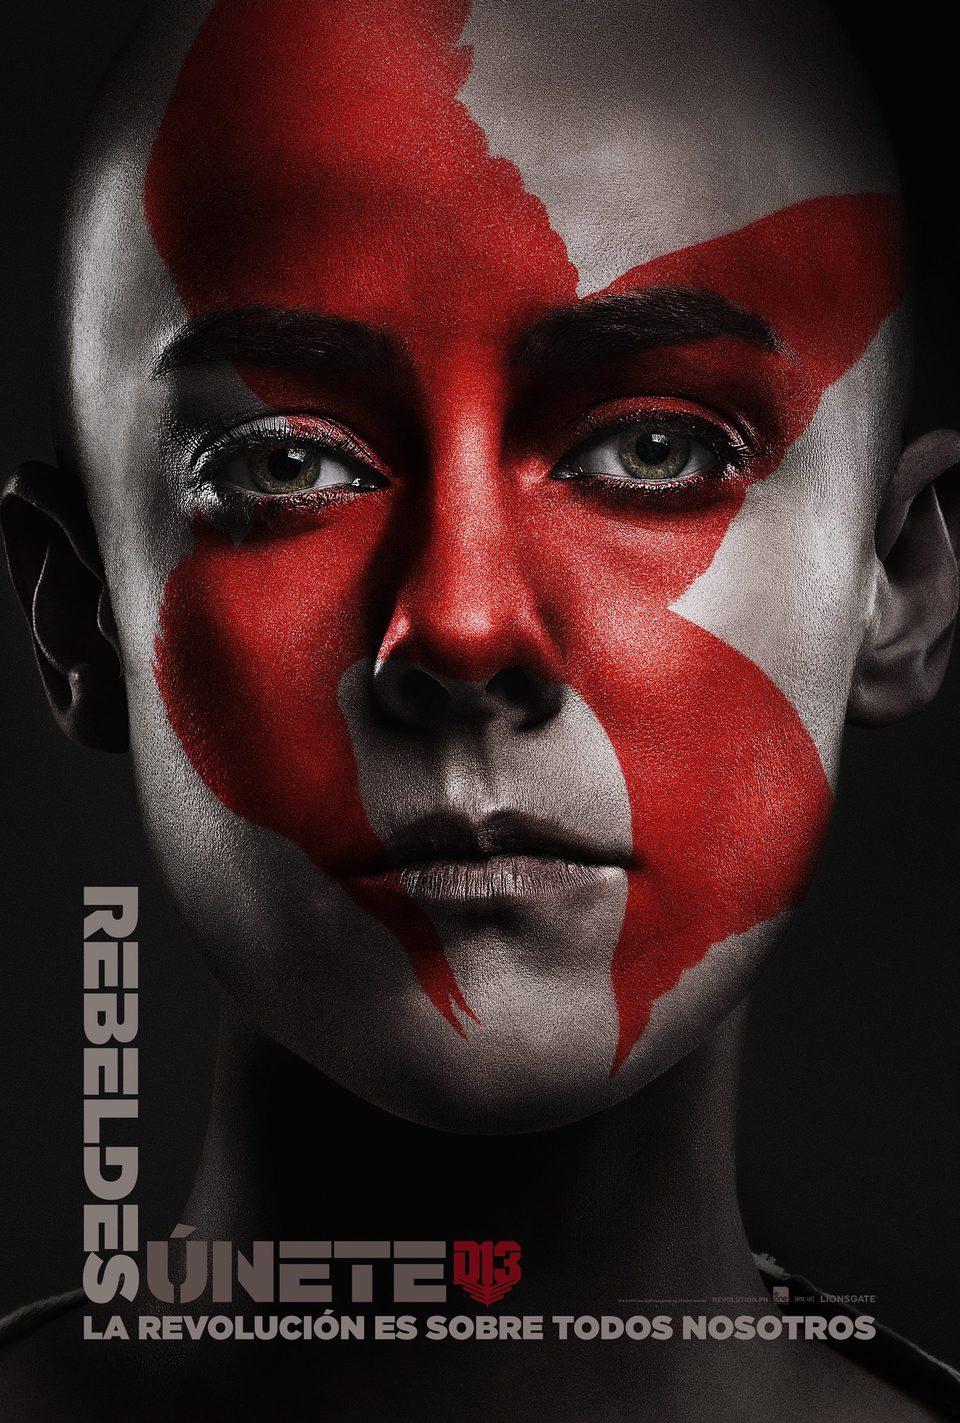 Johanna poster for The Hunger Games: Mockingjay - Part 2